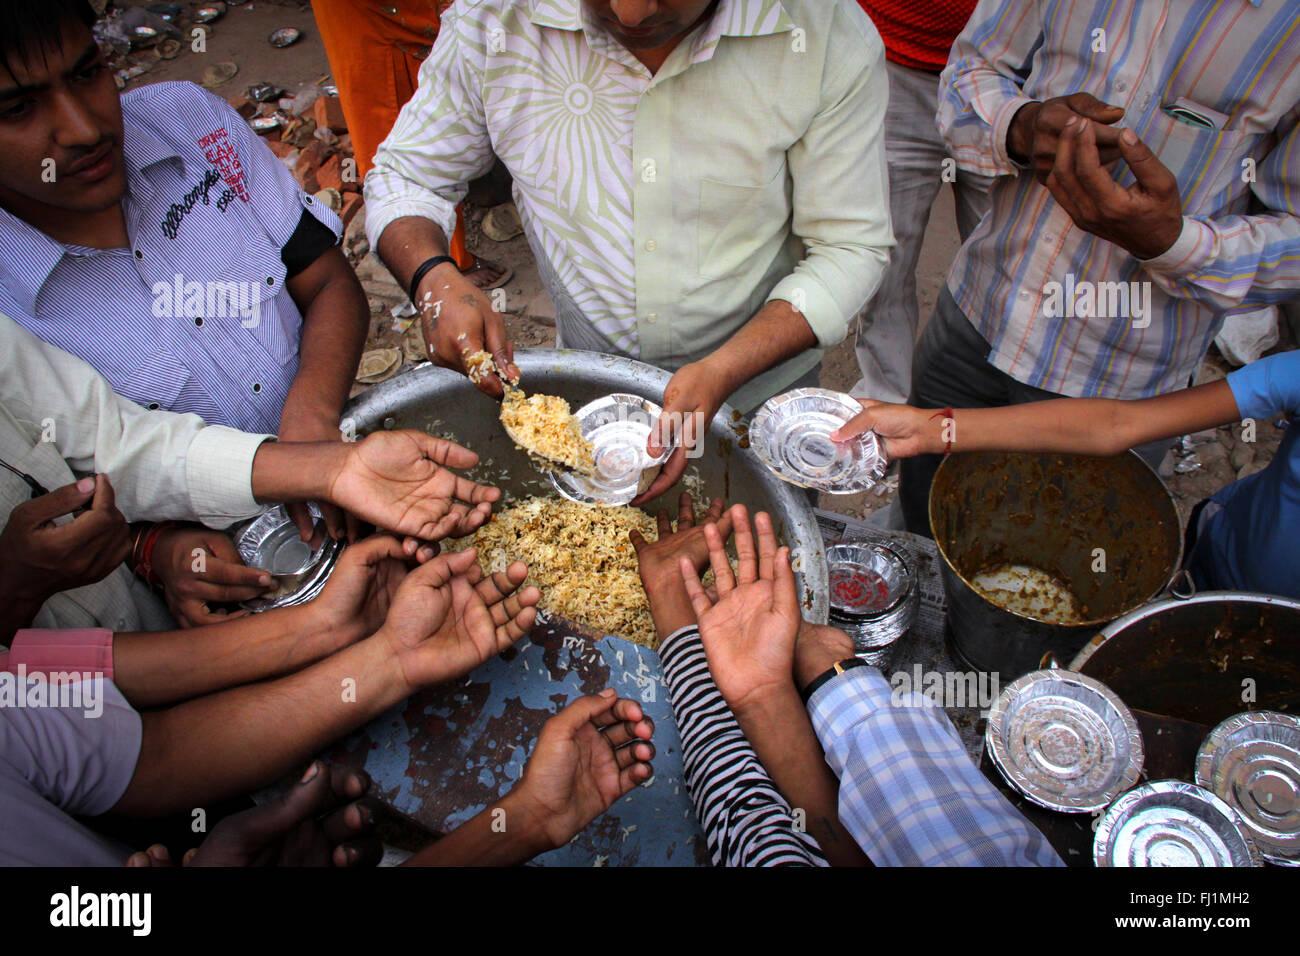 Food Distribution Stock Photos & Food Distribution Stock Images - Alamy